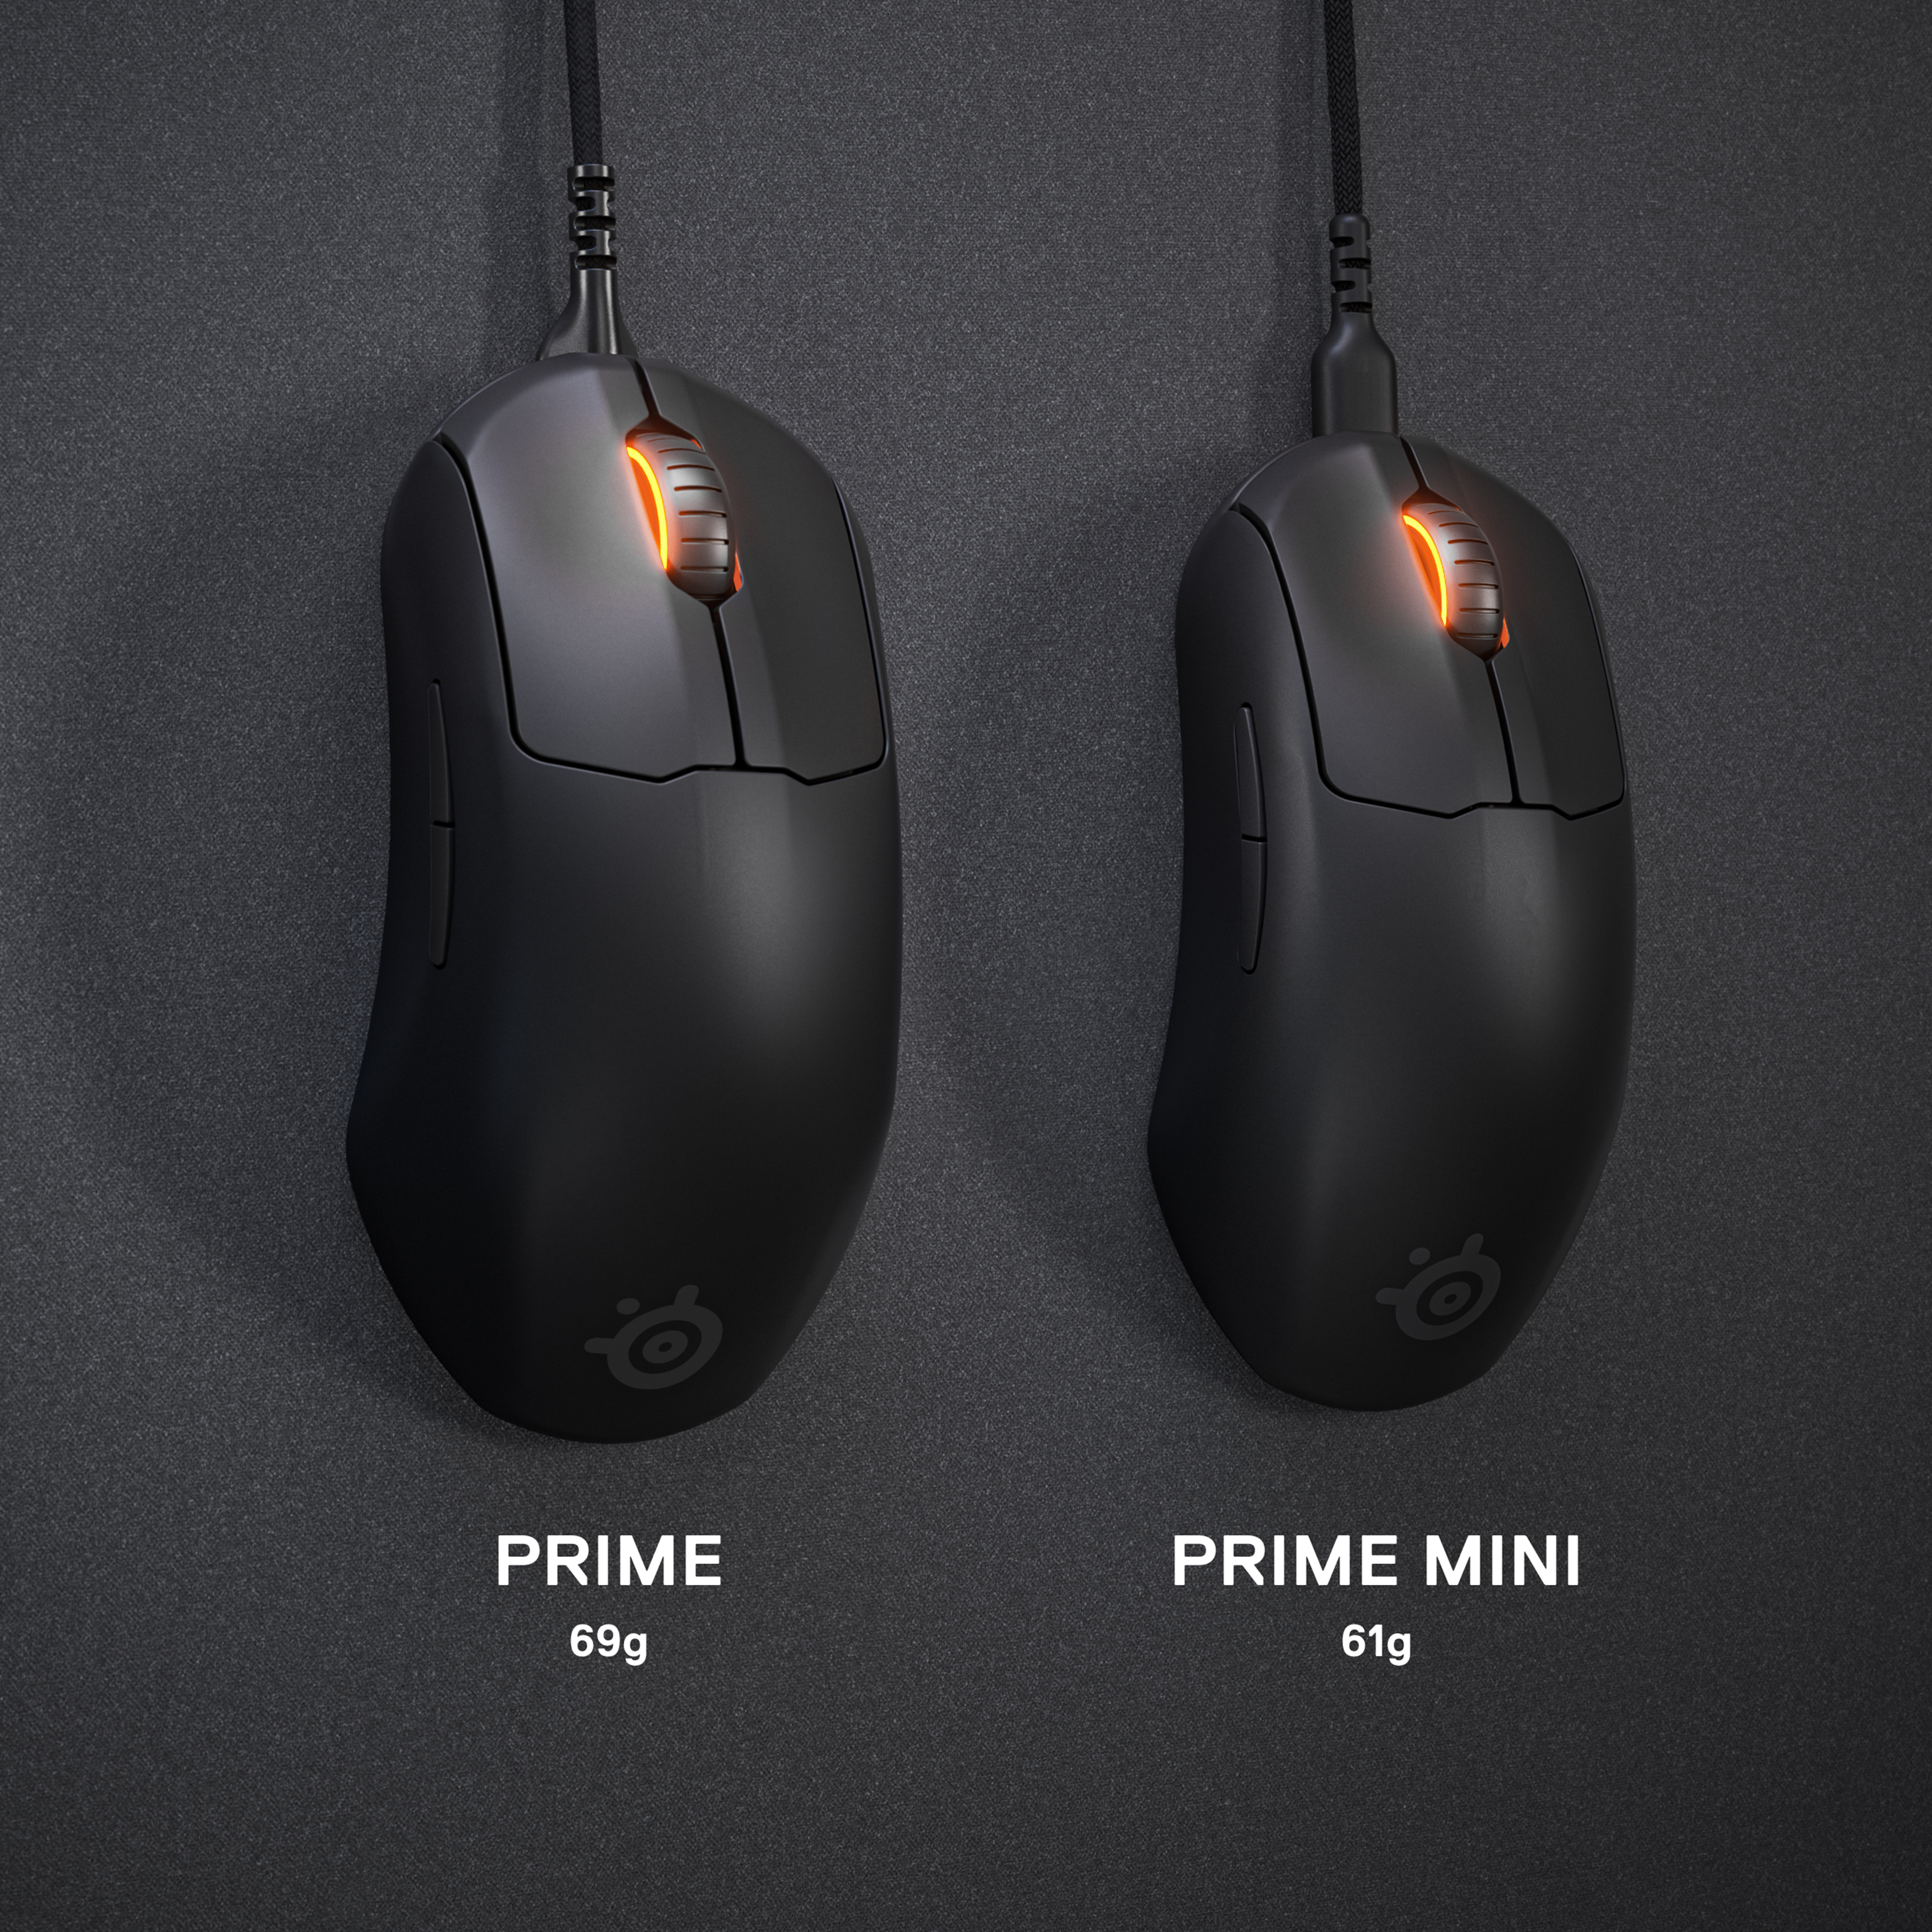 Prime Mini